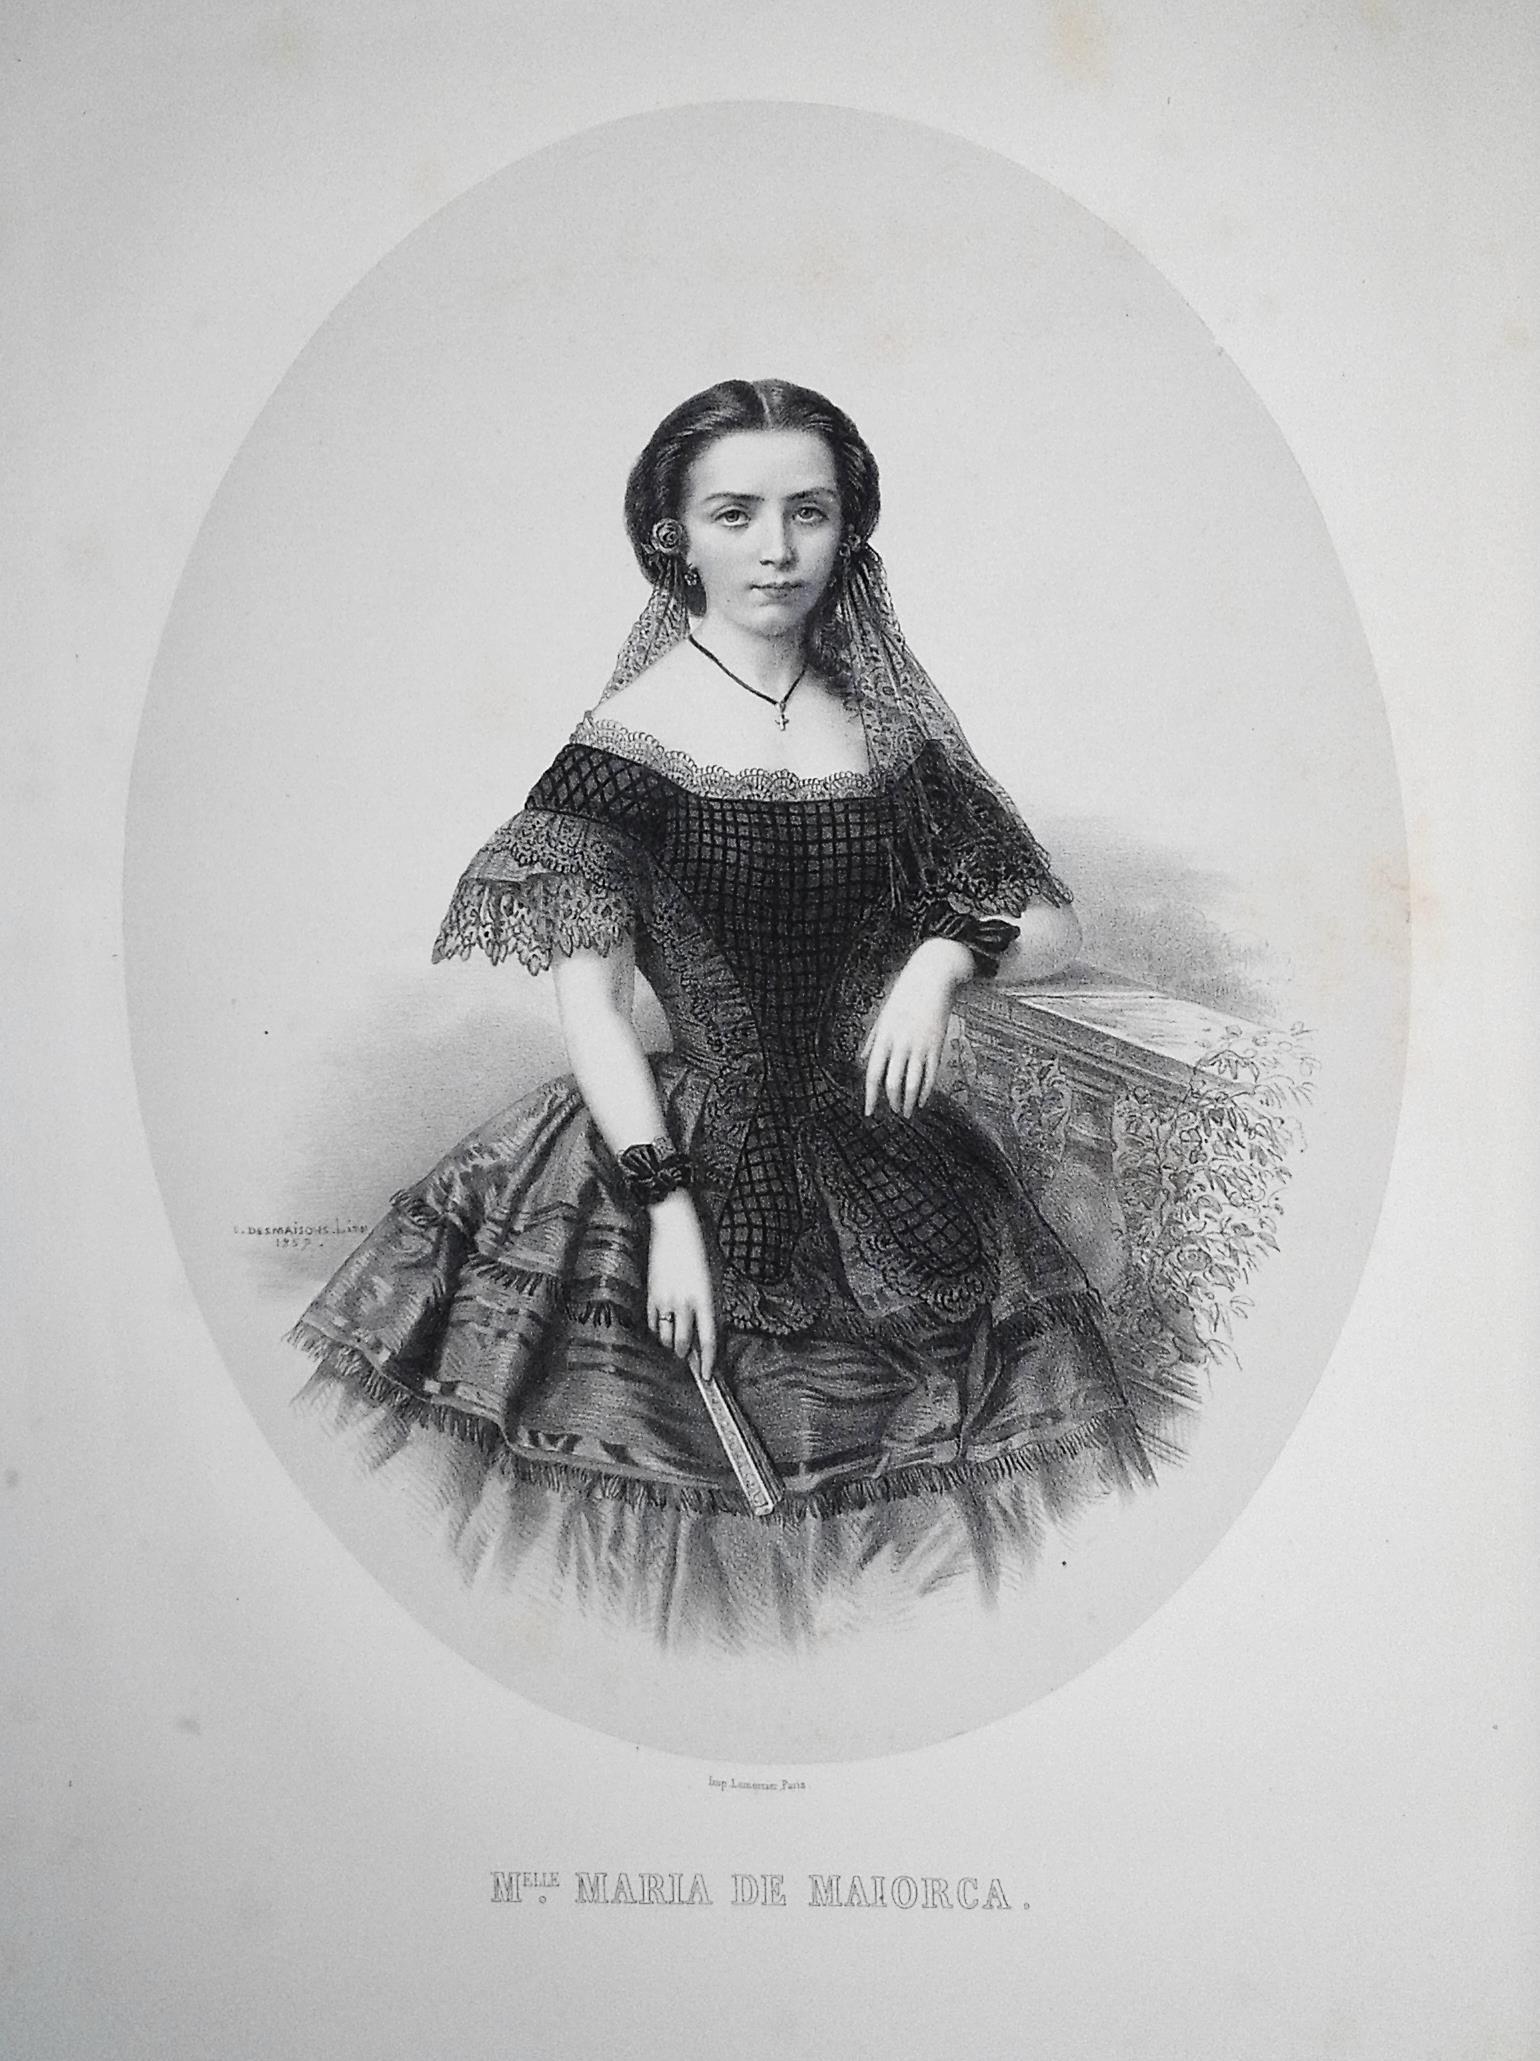 Melle. Maria de Maiorca [fille de Mr. le Vicomte de Maiorca, de Portugal]